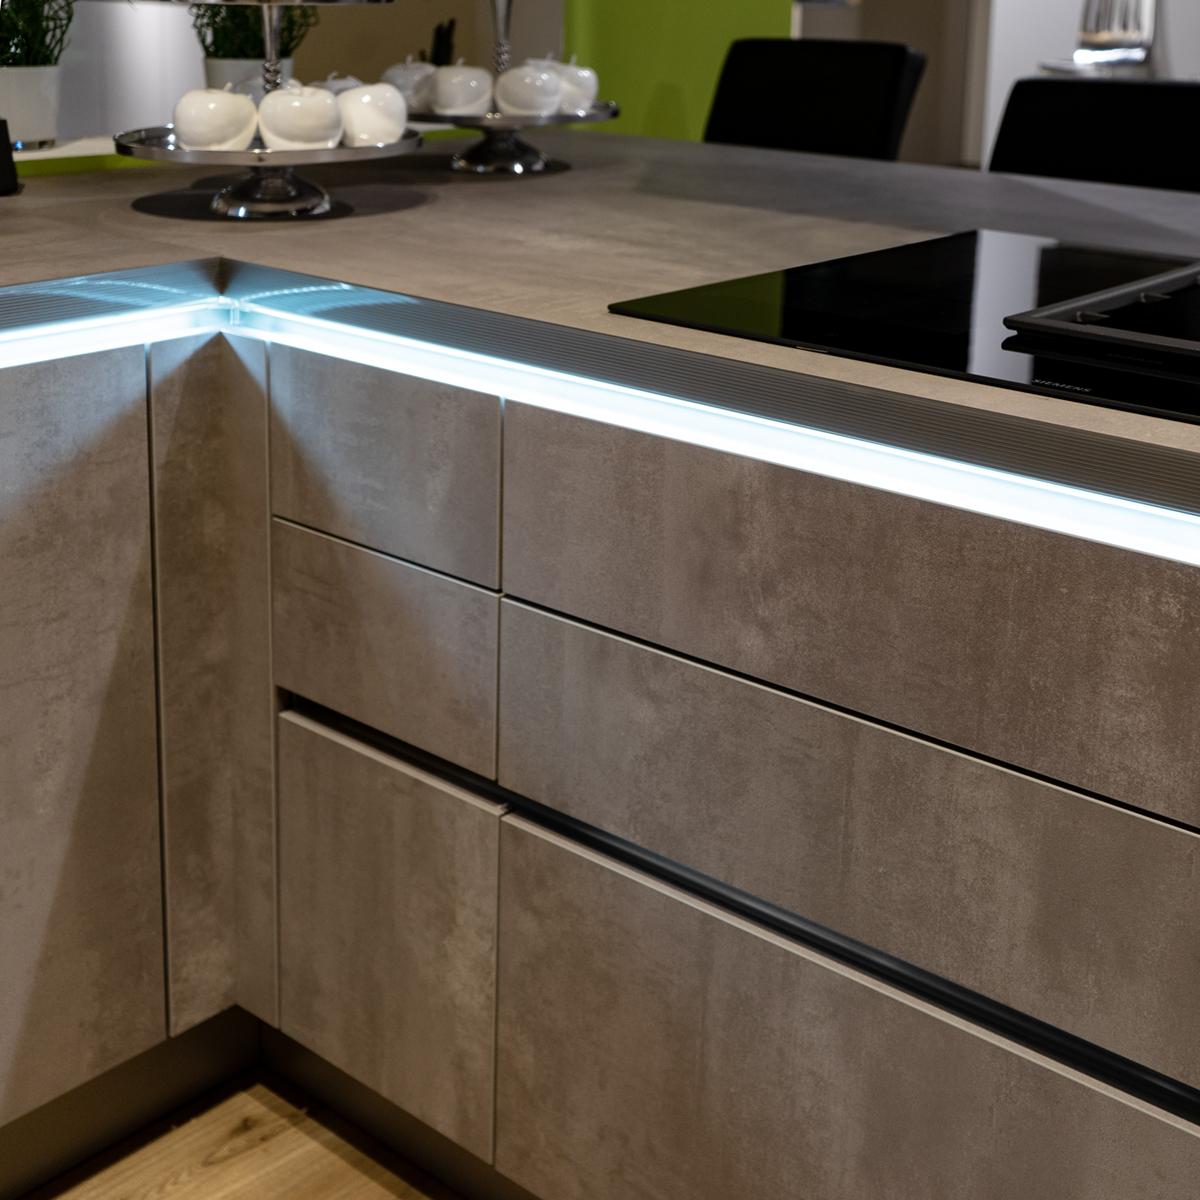 Licht-Konzepte-Kueche-Reling-LED_SAAR-Kuechen